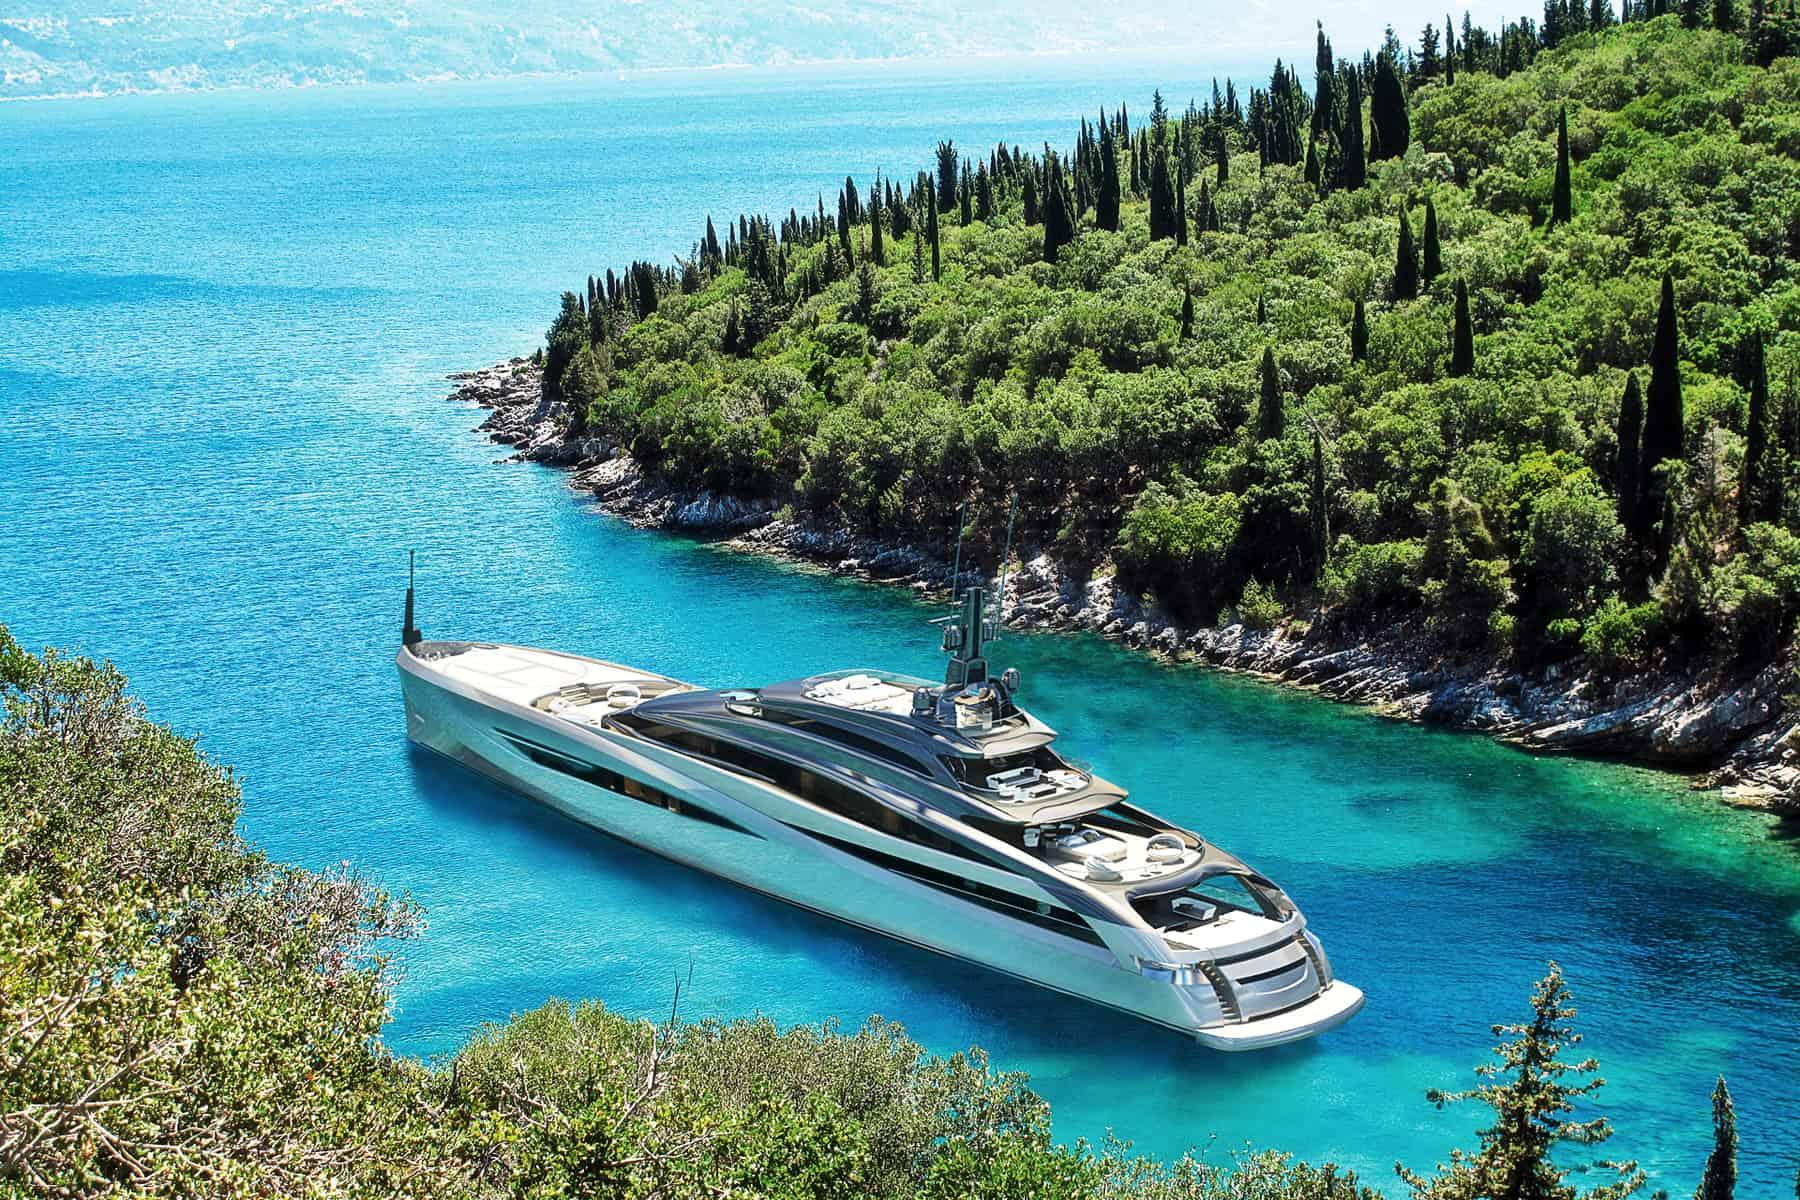 Infinity is Rossinavi's Brand New Superyacht Concept